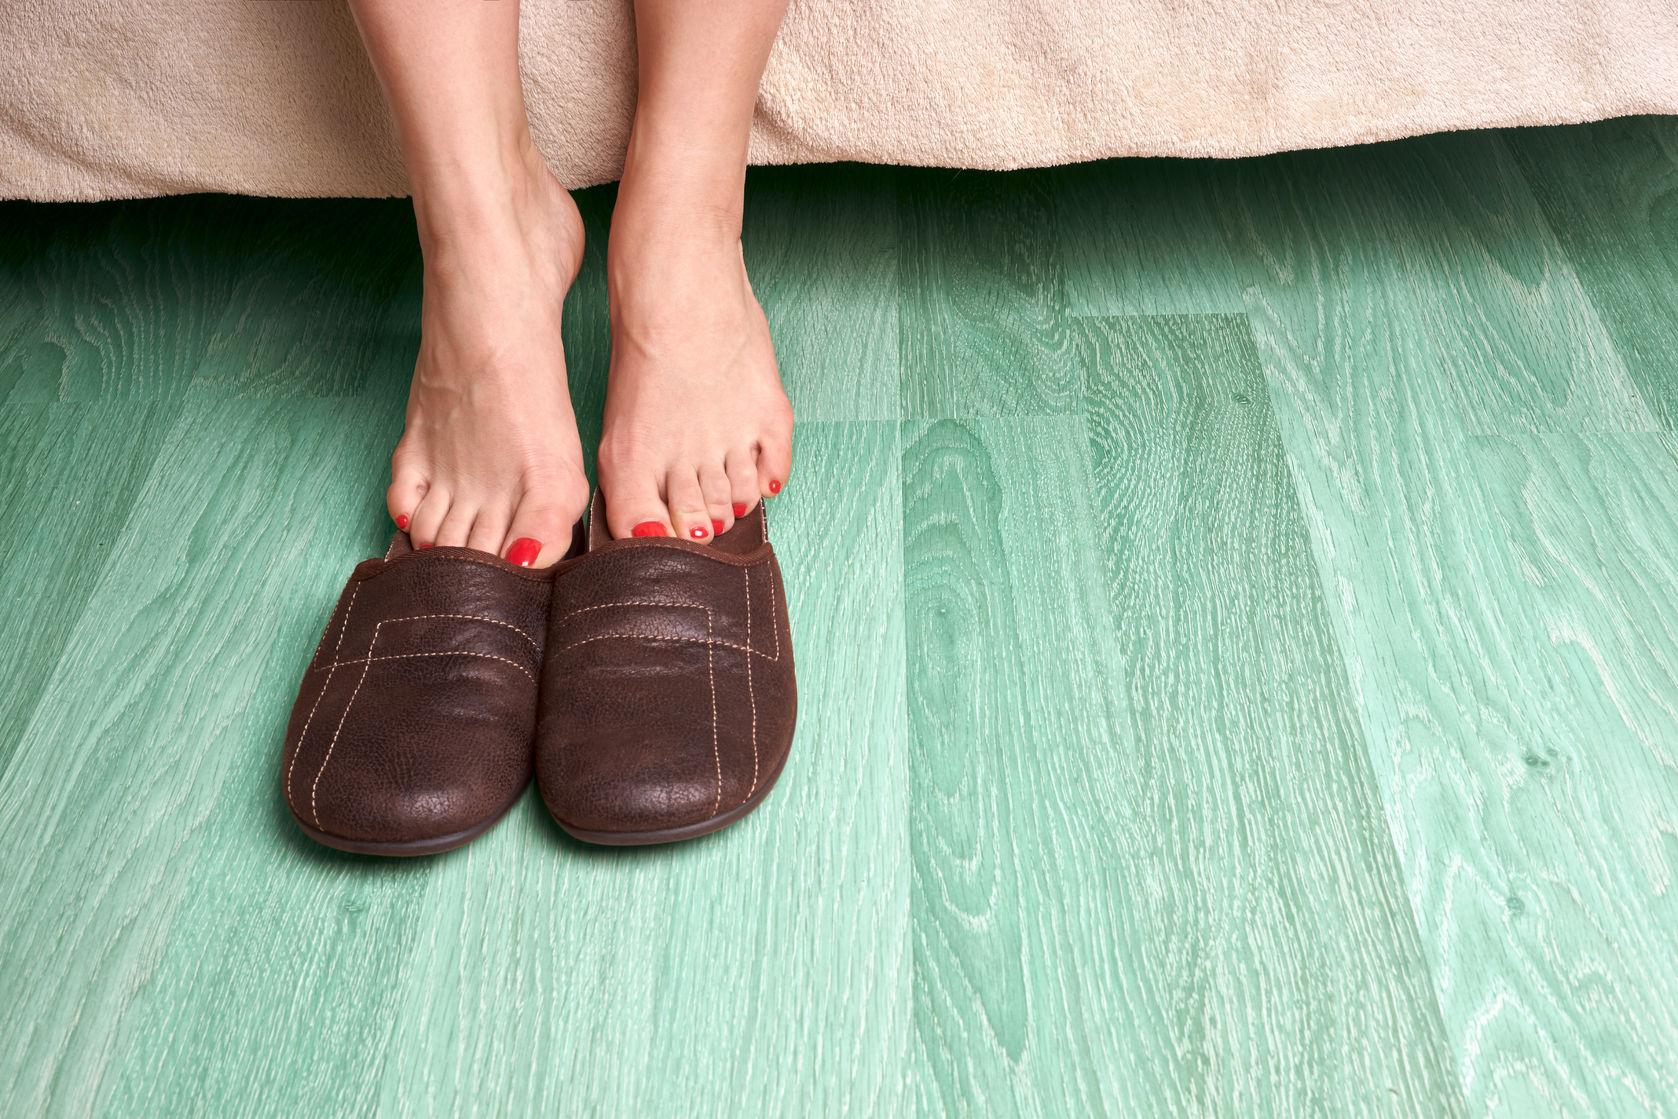 Female Feet in Slippers Image